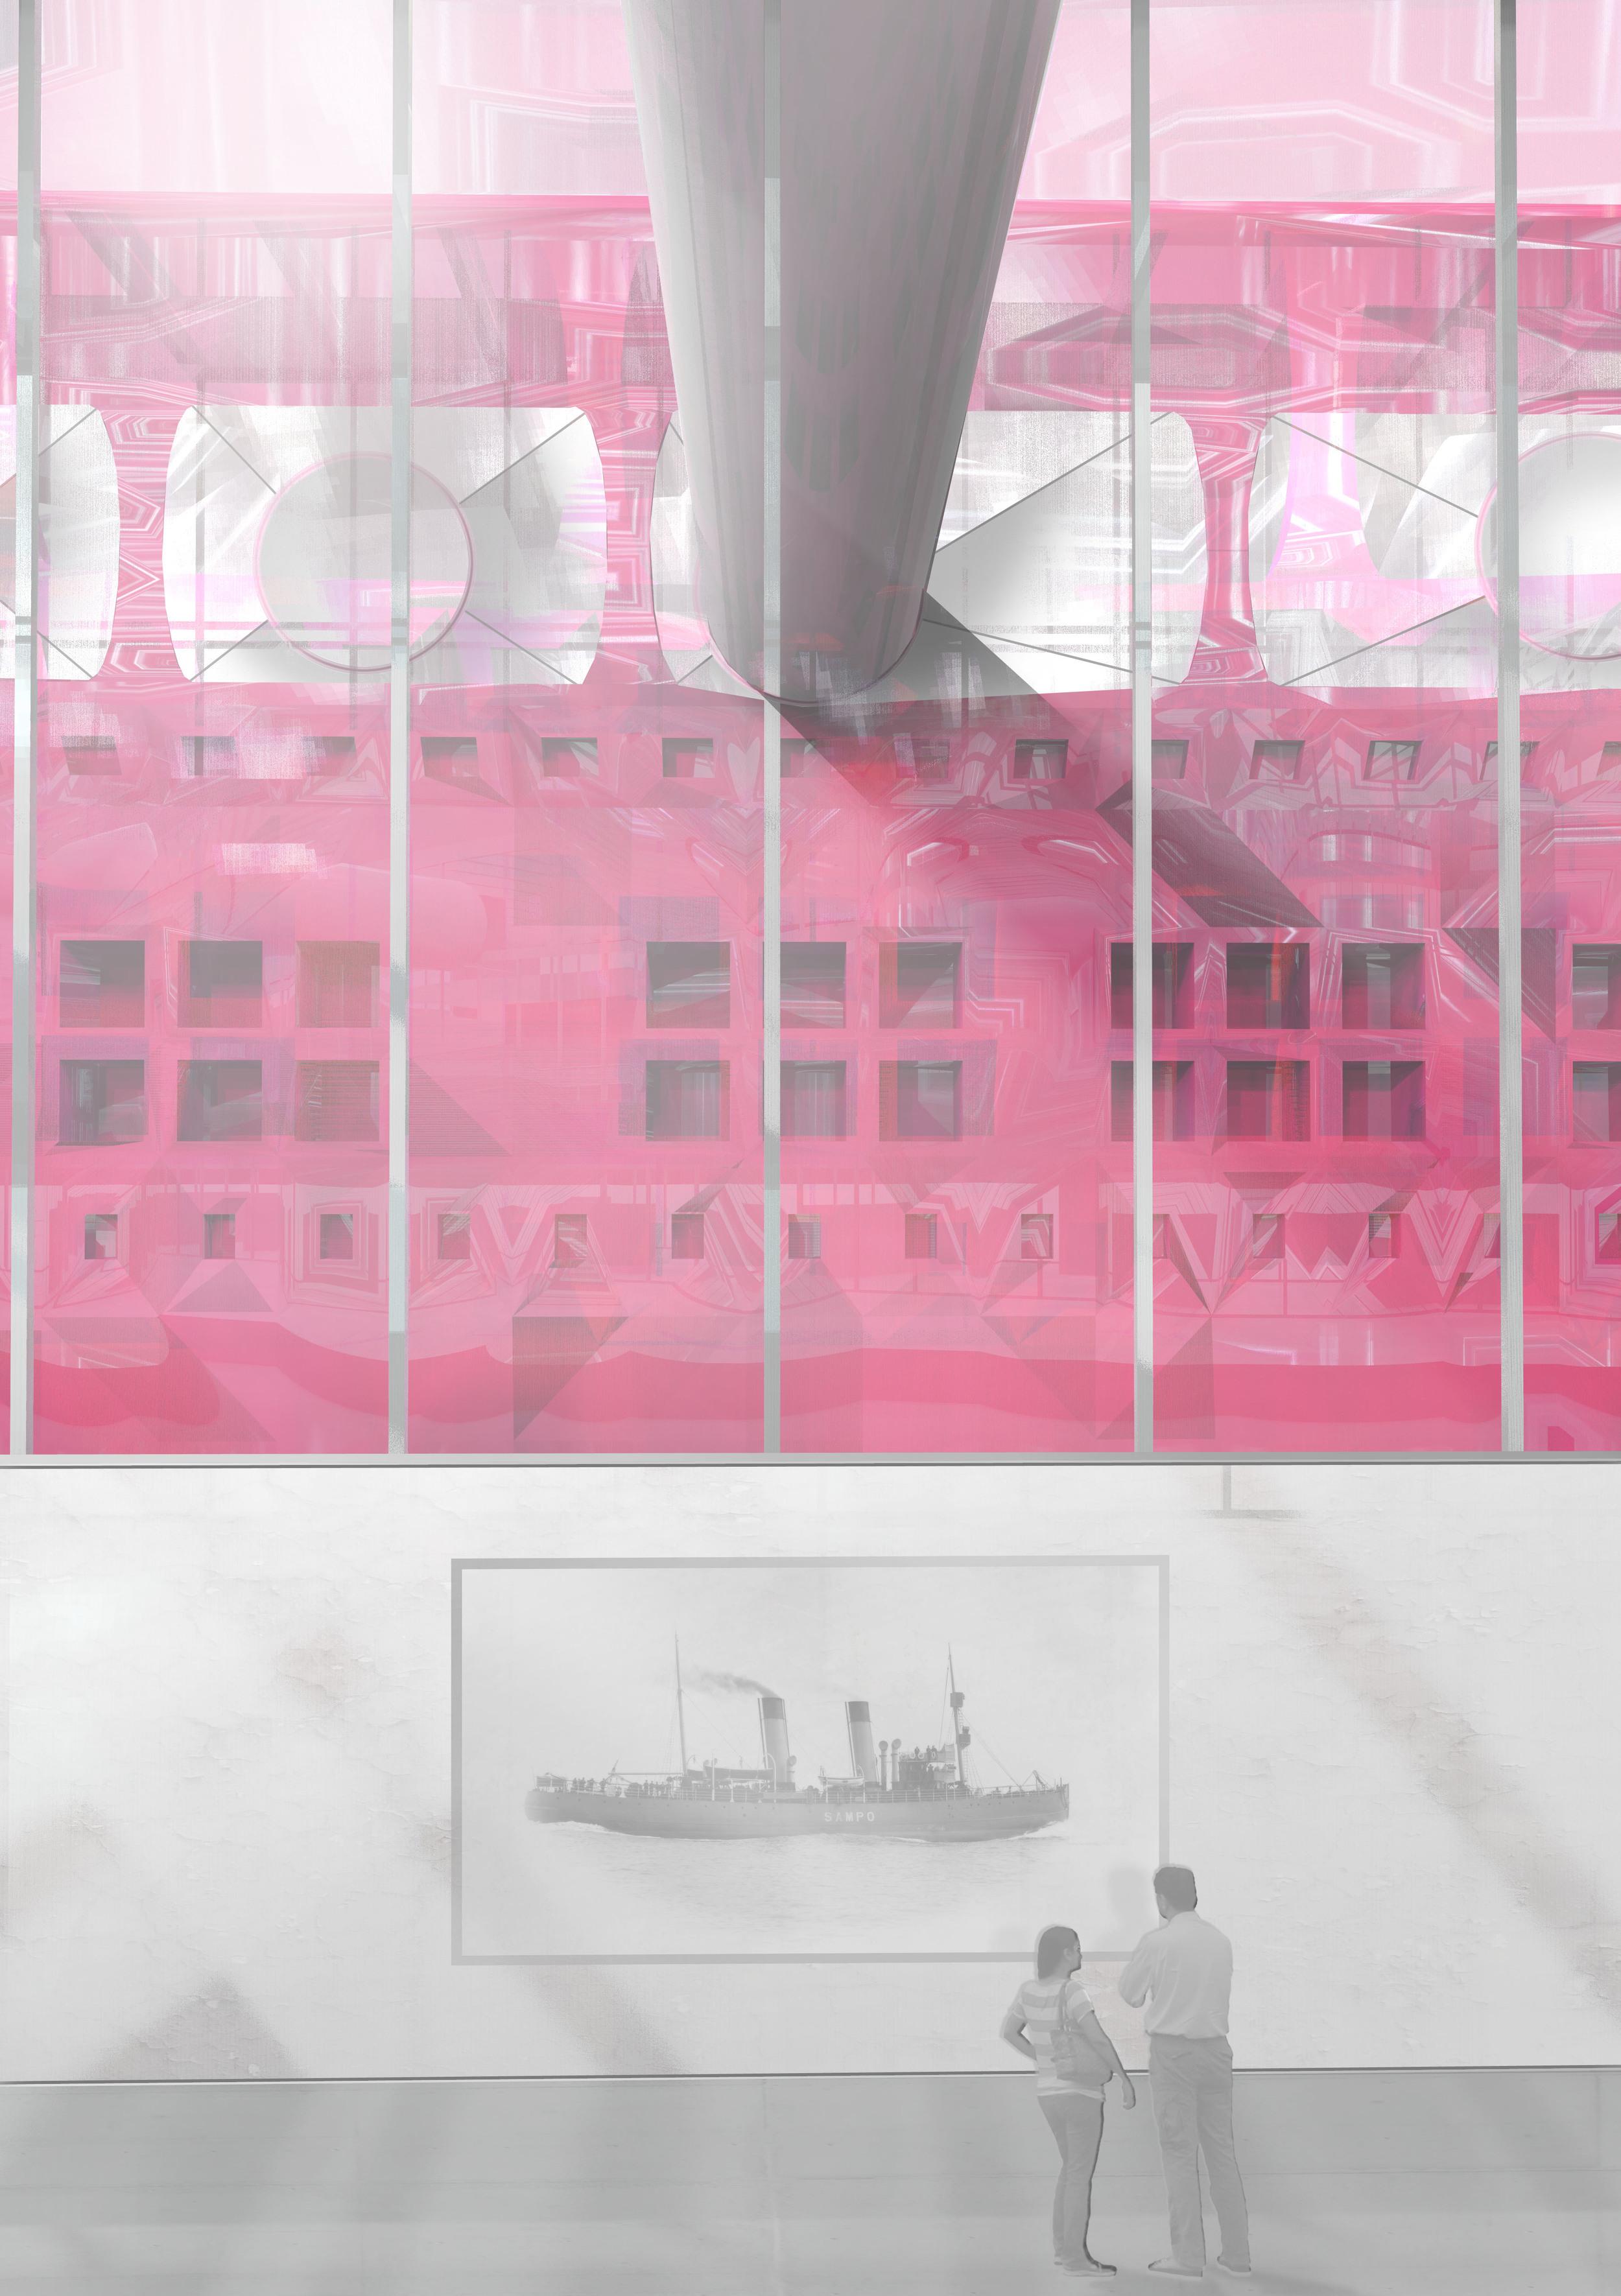 Helsinki_artdisplay_2014-09-04.jpg